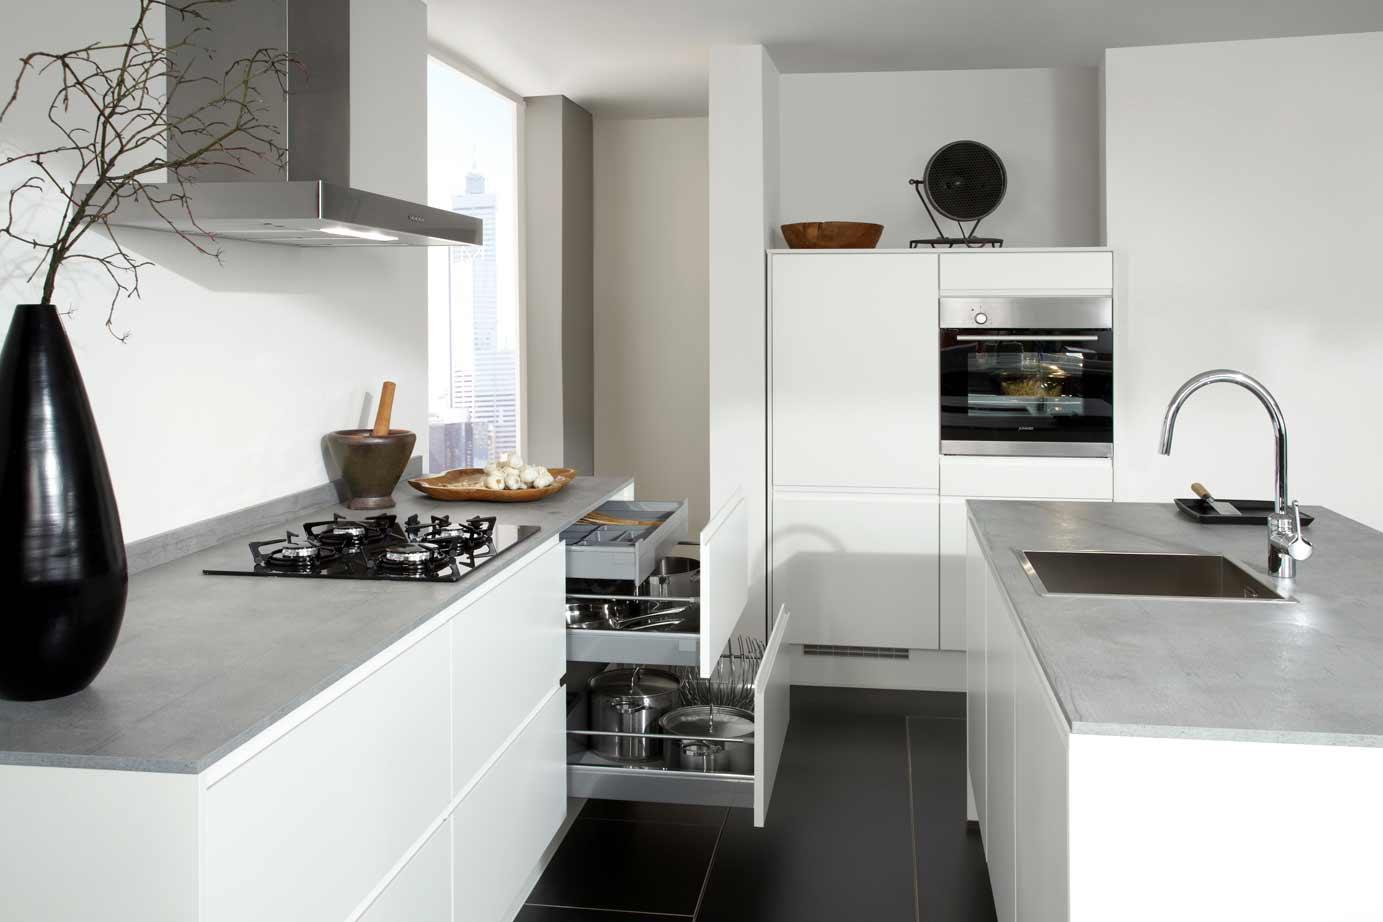 Design Keuken Kopen : Design keuken